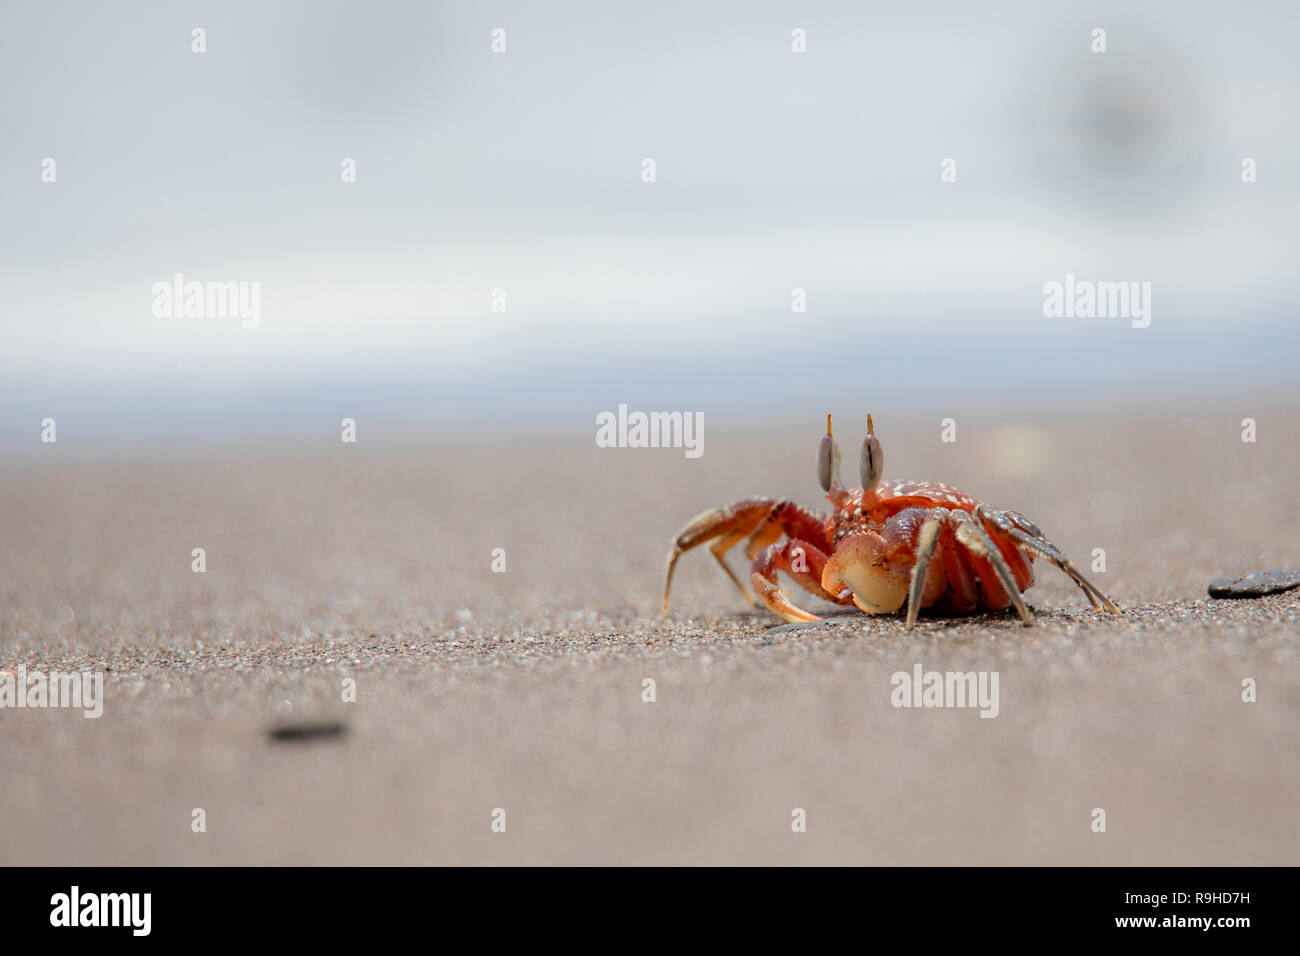 Red ghost crab cangrejo fantasma rojo Isla de la Plata Ecuador Foto Stock